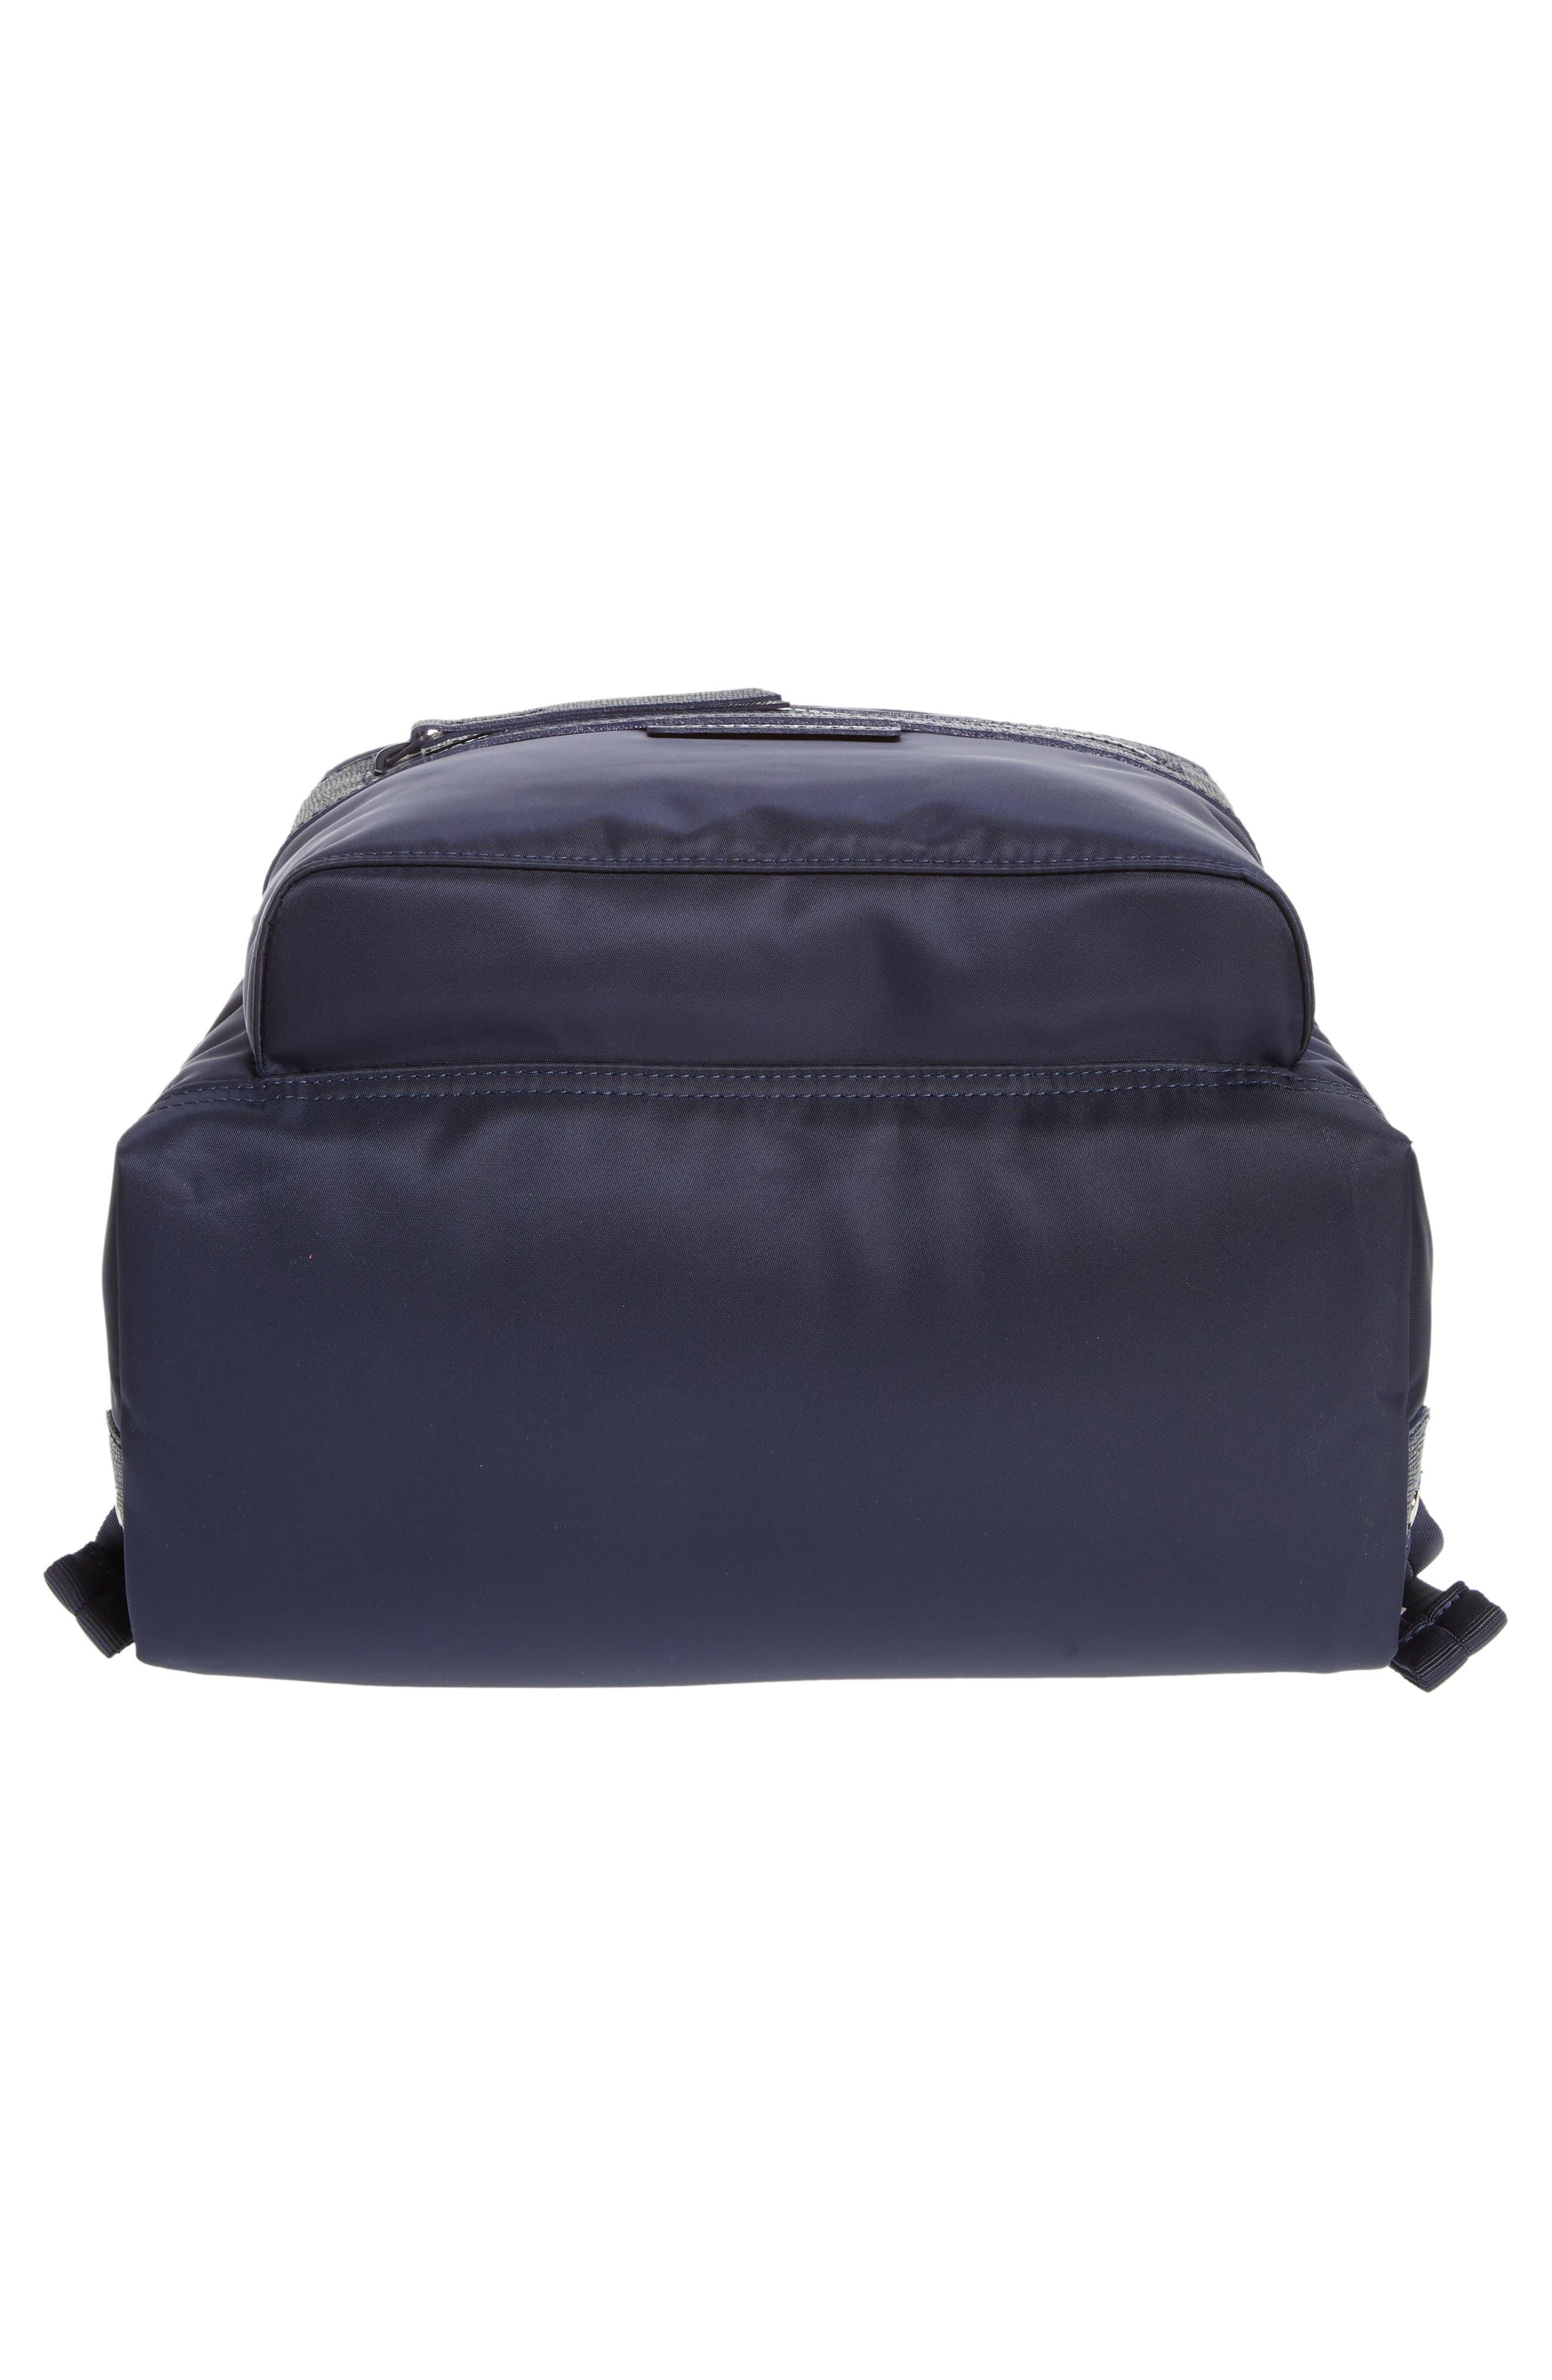 LONGCHAMP, 'Le Pliage Neo' Nylon Backpack, Alternate thumbnail 7, color, NAVY BLUE